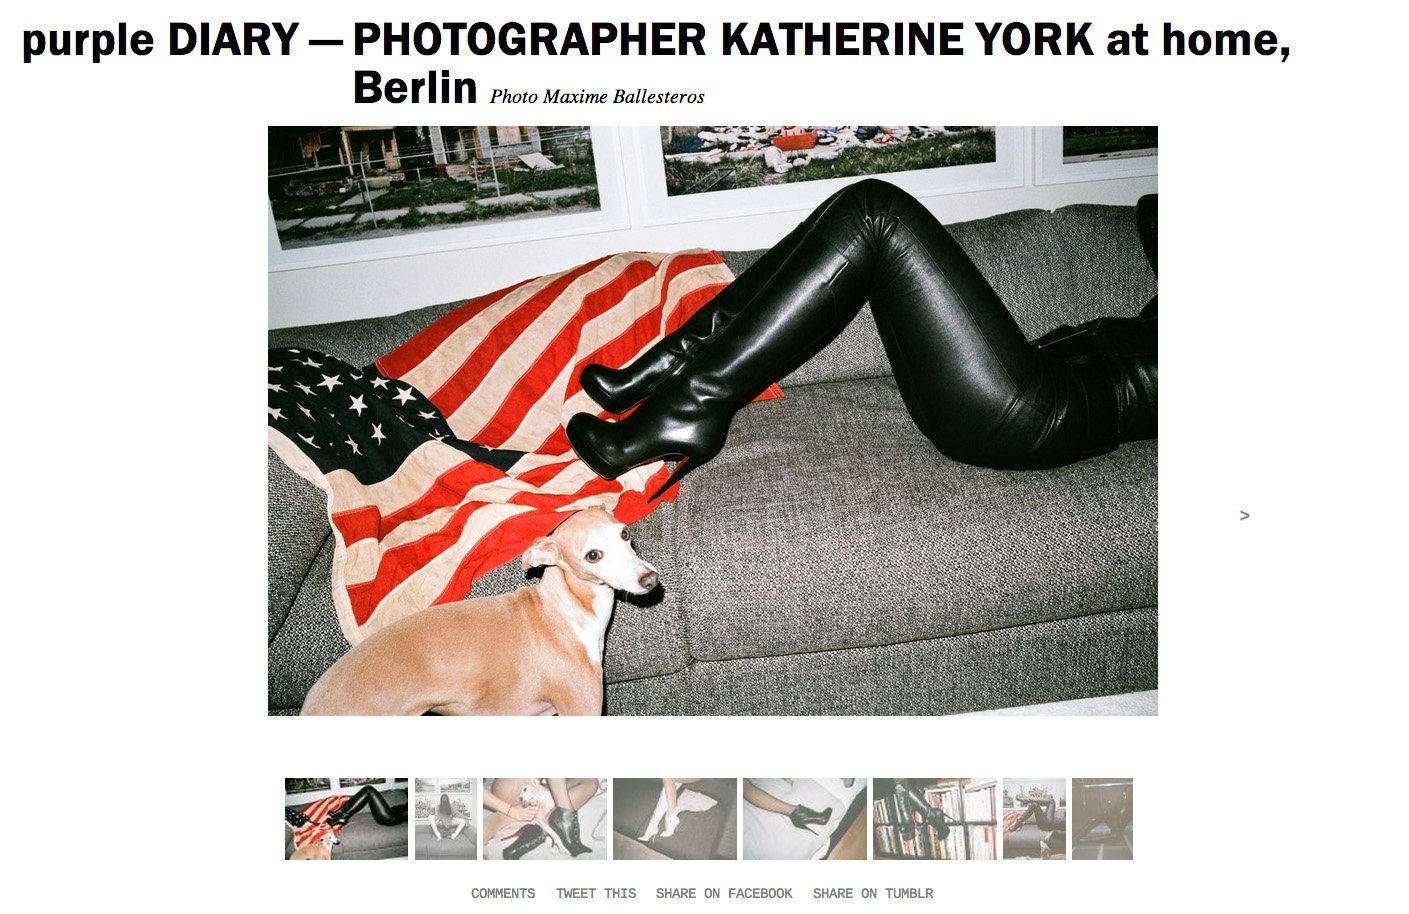 purple DIARY   PHOTOGRAPHER KATHERINE YORK at home  Berlin.jpg